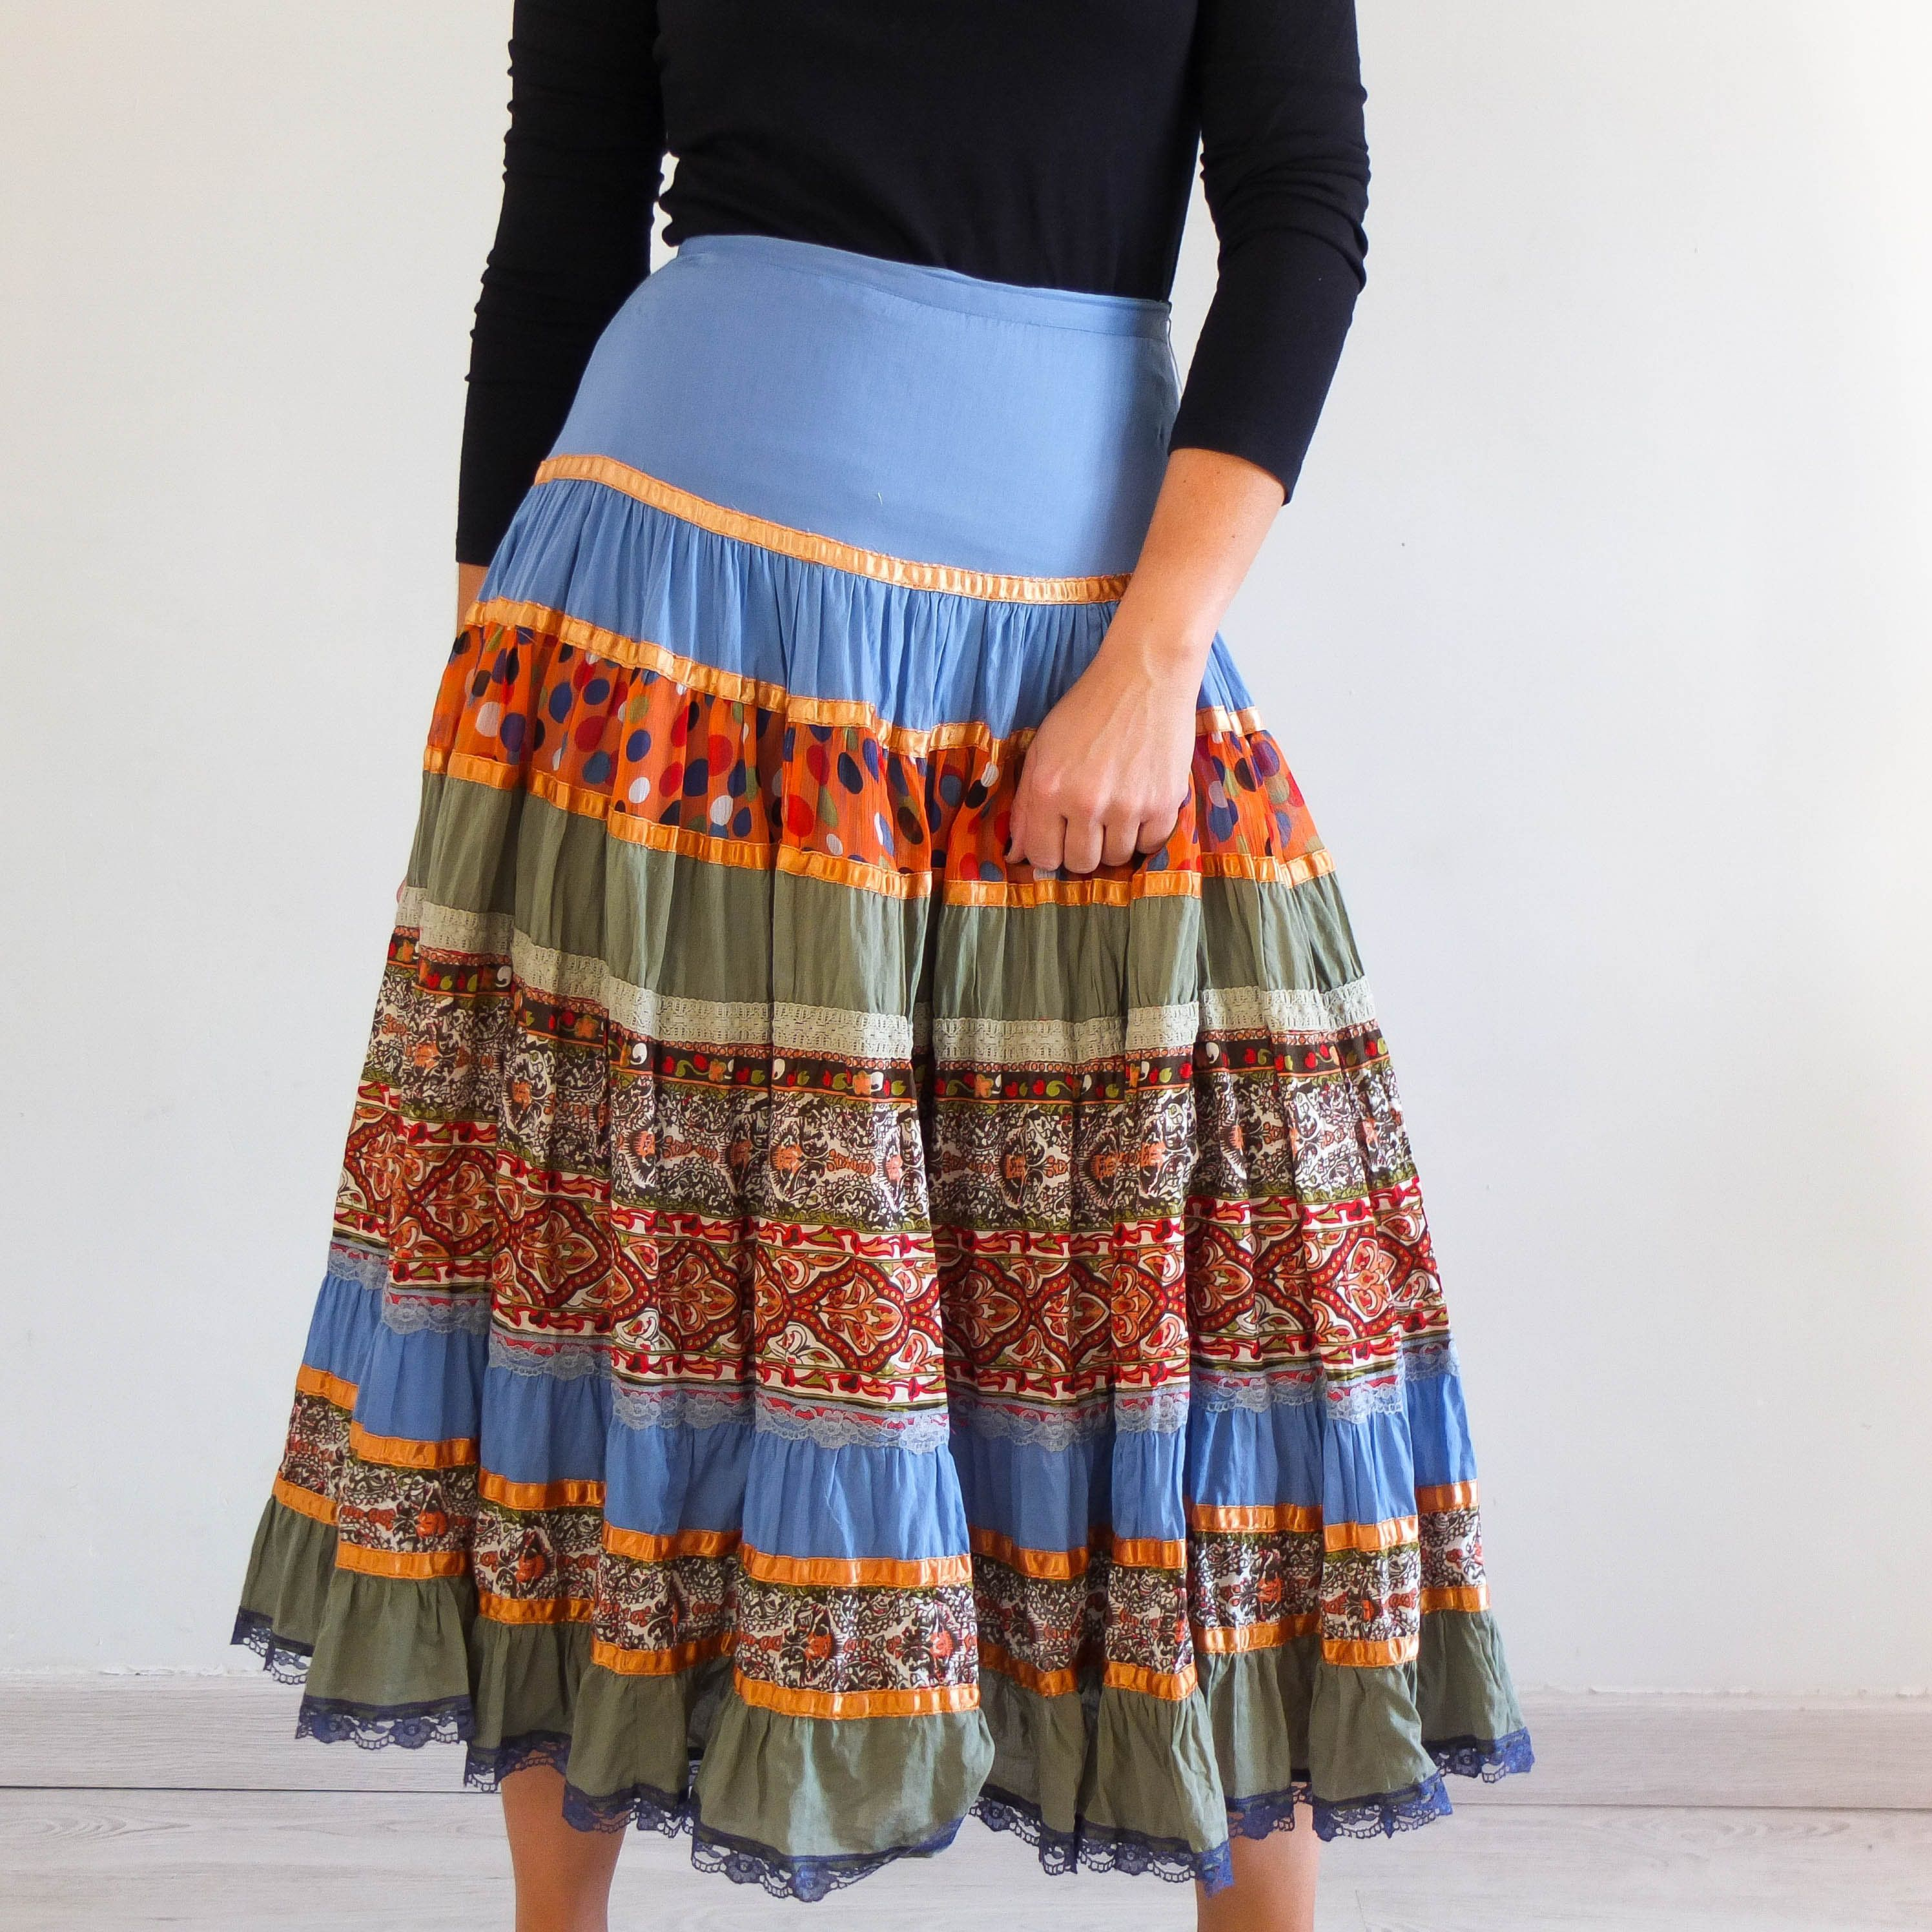 Vintage Maxi Skirt Prairie Peasant Boho Patchwork print fabric ruffle bottom 12